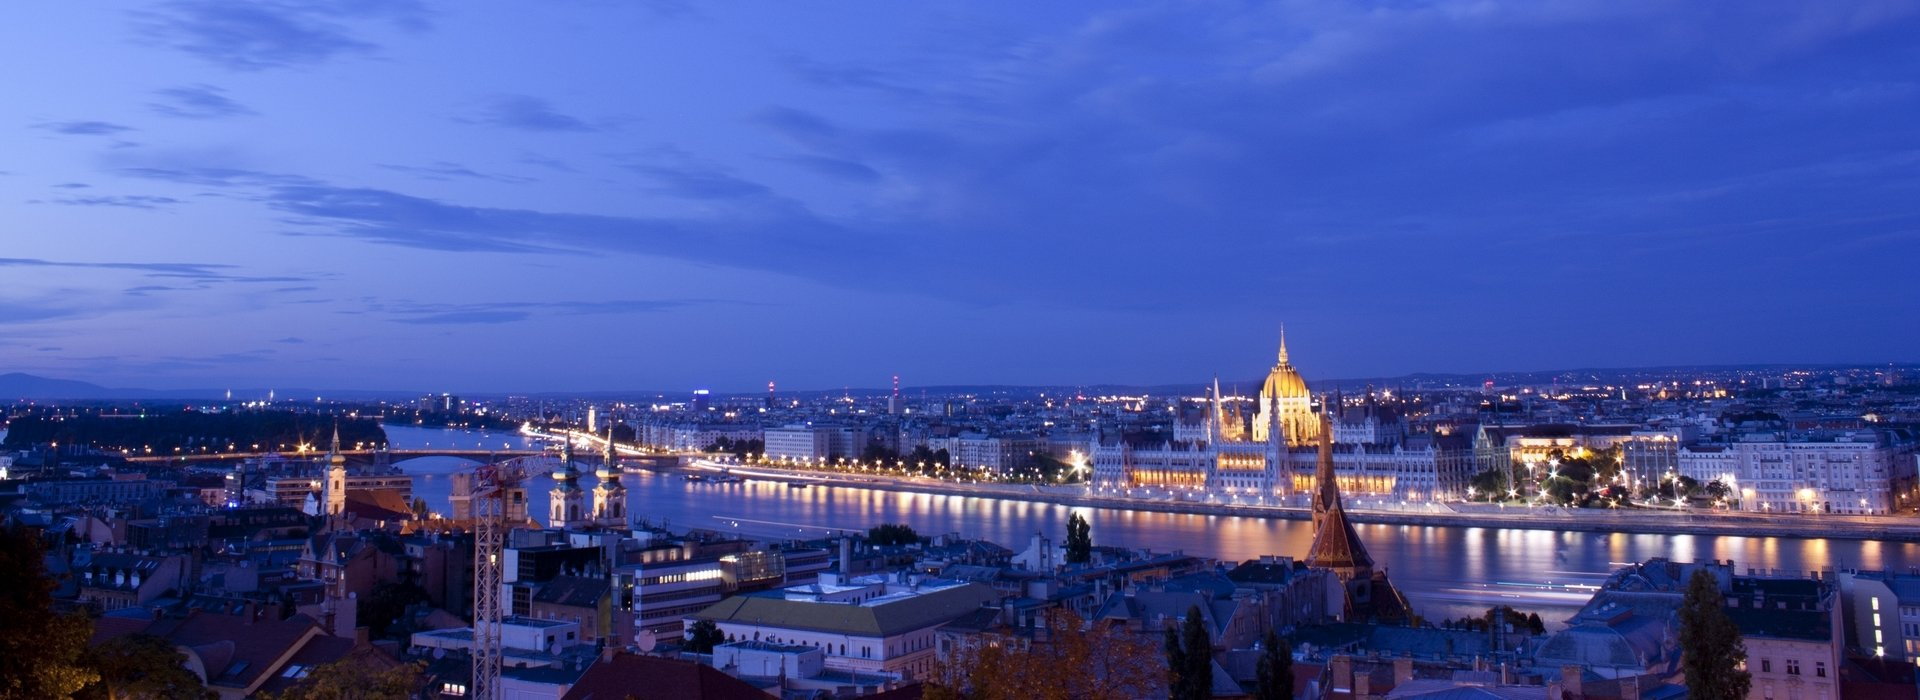 Budapest Általános Adatok – Budapest Info